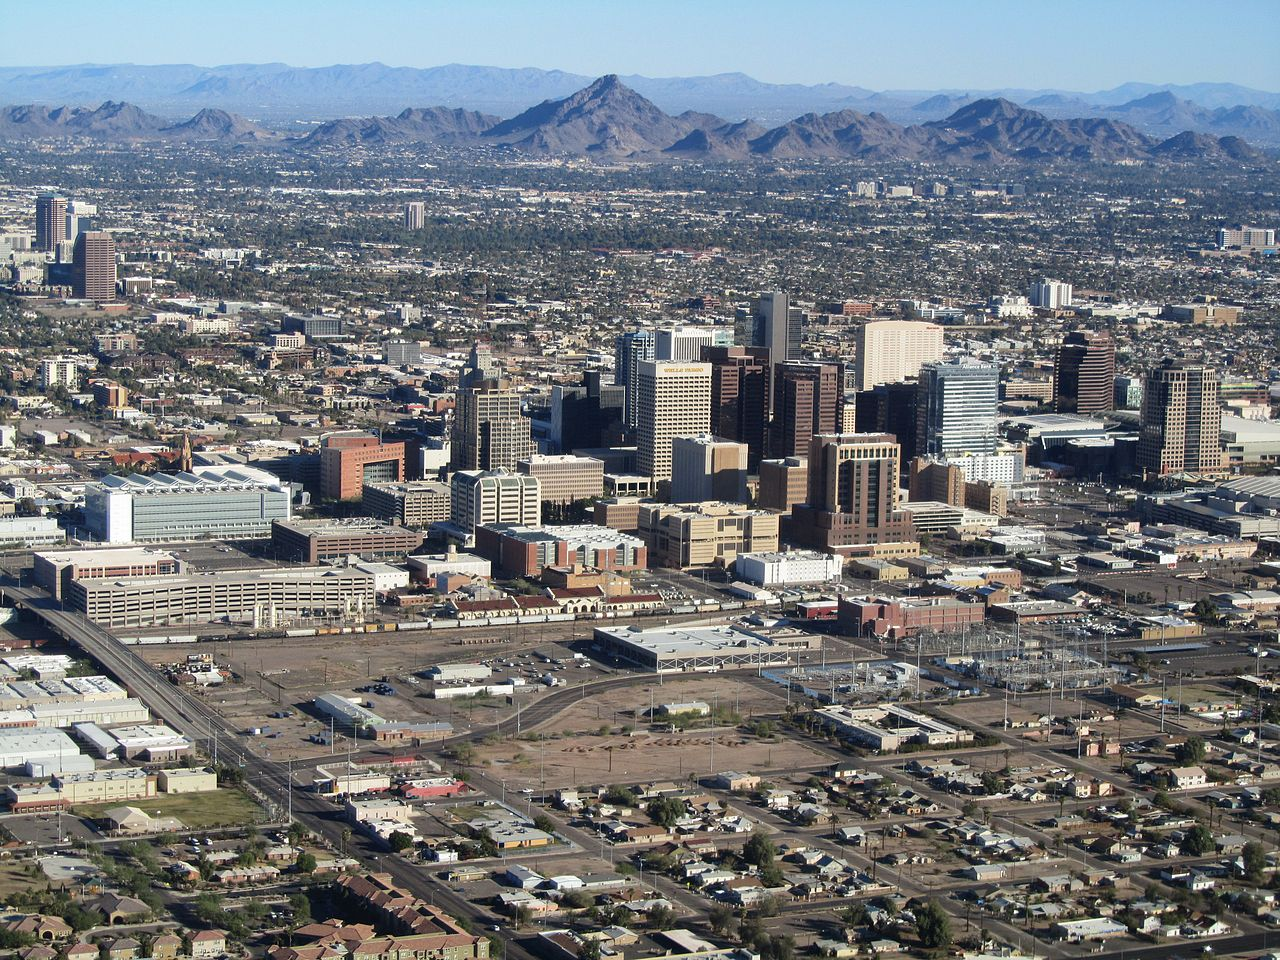 Mall Scottsdale Arizona